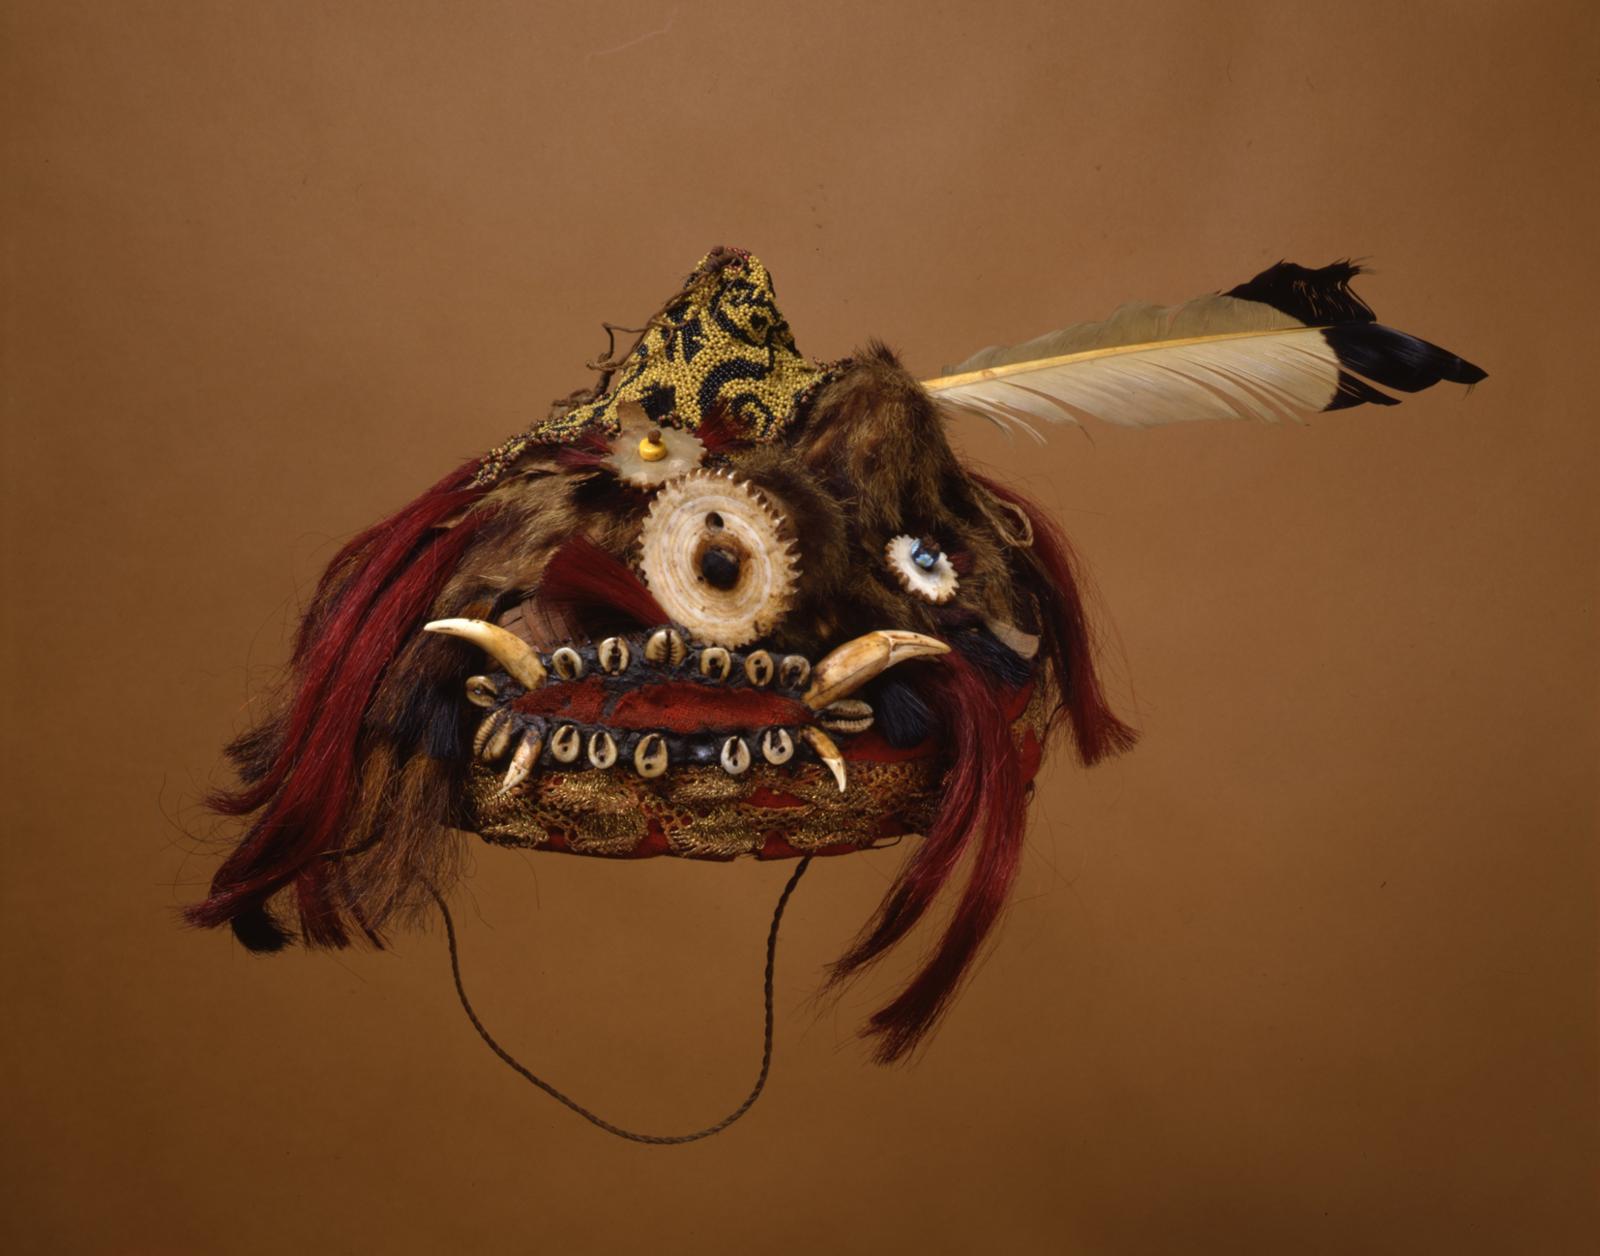 Dayak Warrior's Headdress   Gift of Dr. William H. Furness 3rd, 1898   Object #: P1139B   Penn Museum